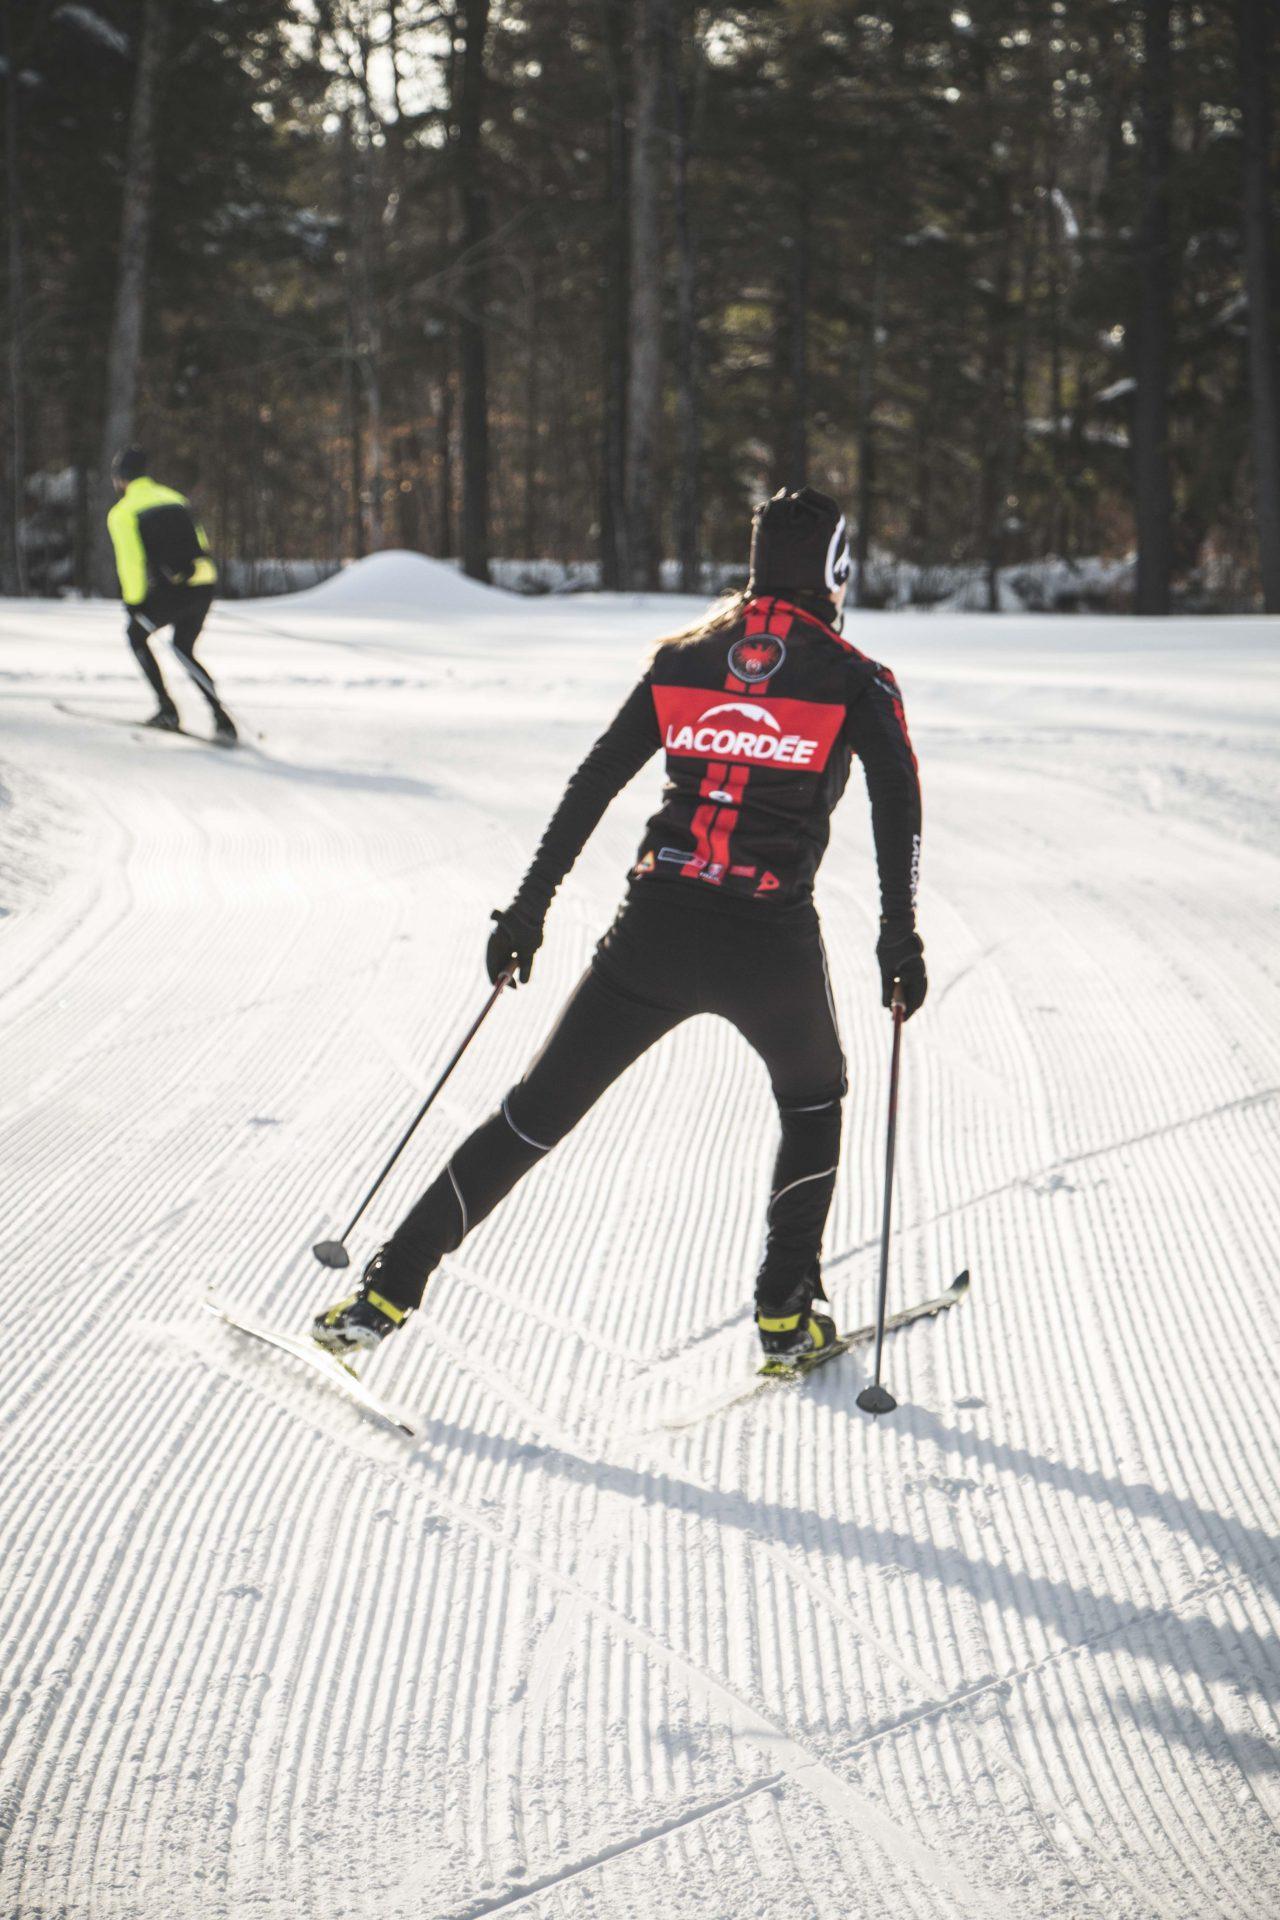 Technique Ski De Fond Skating : technique, skating, Conseils, Skier, Blogue, Cordée:, Plein, Vélo